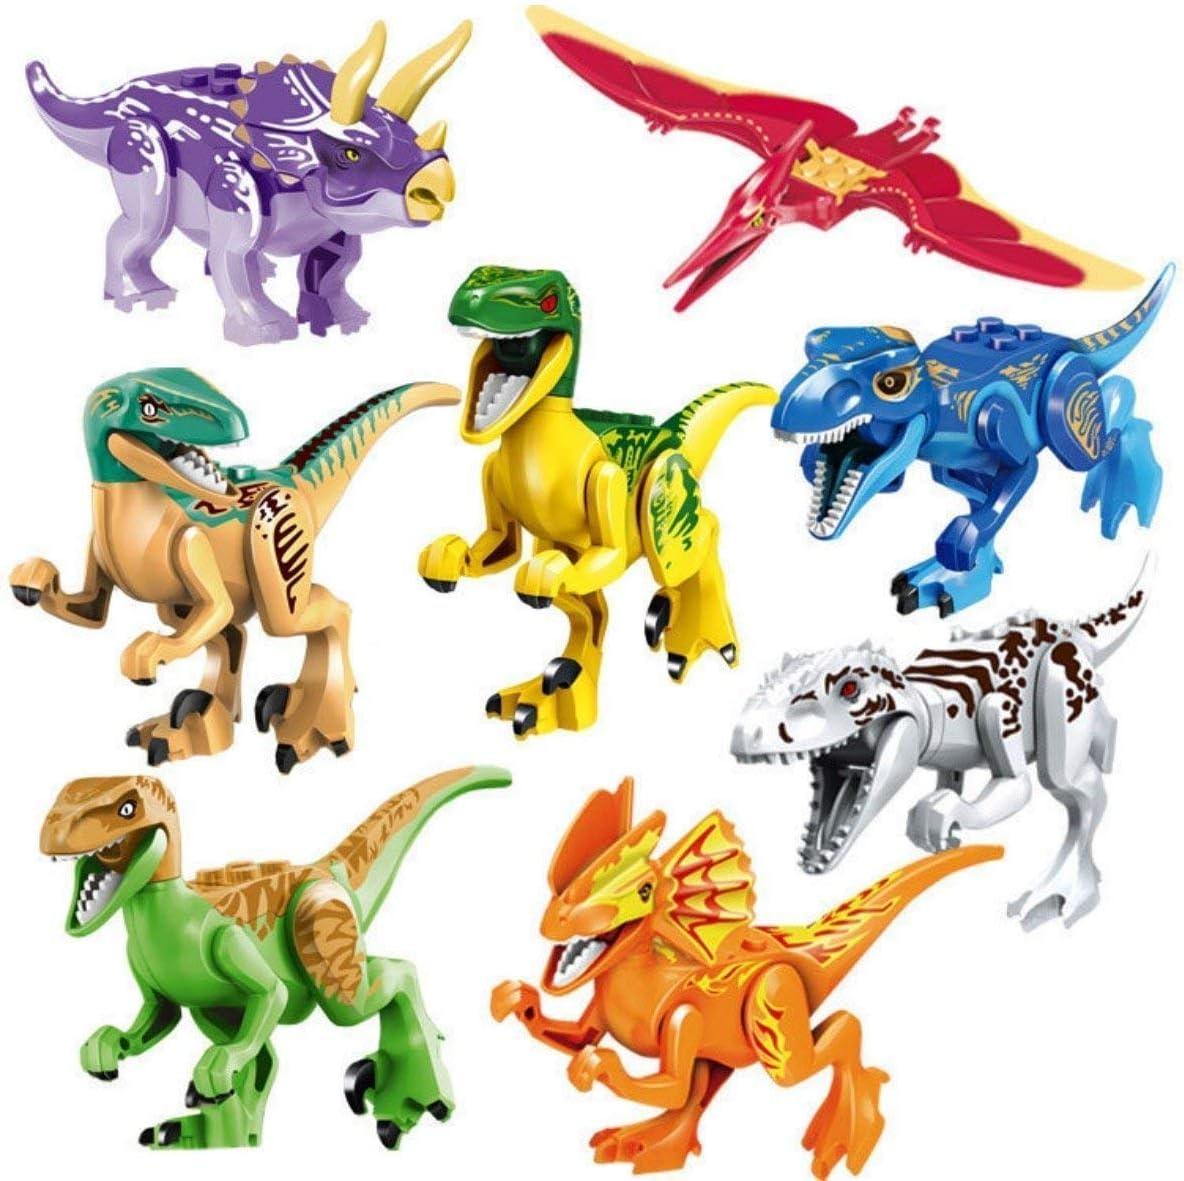 16pc Dinosaur Building Block Toys